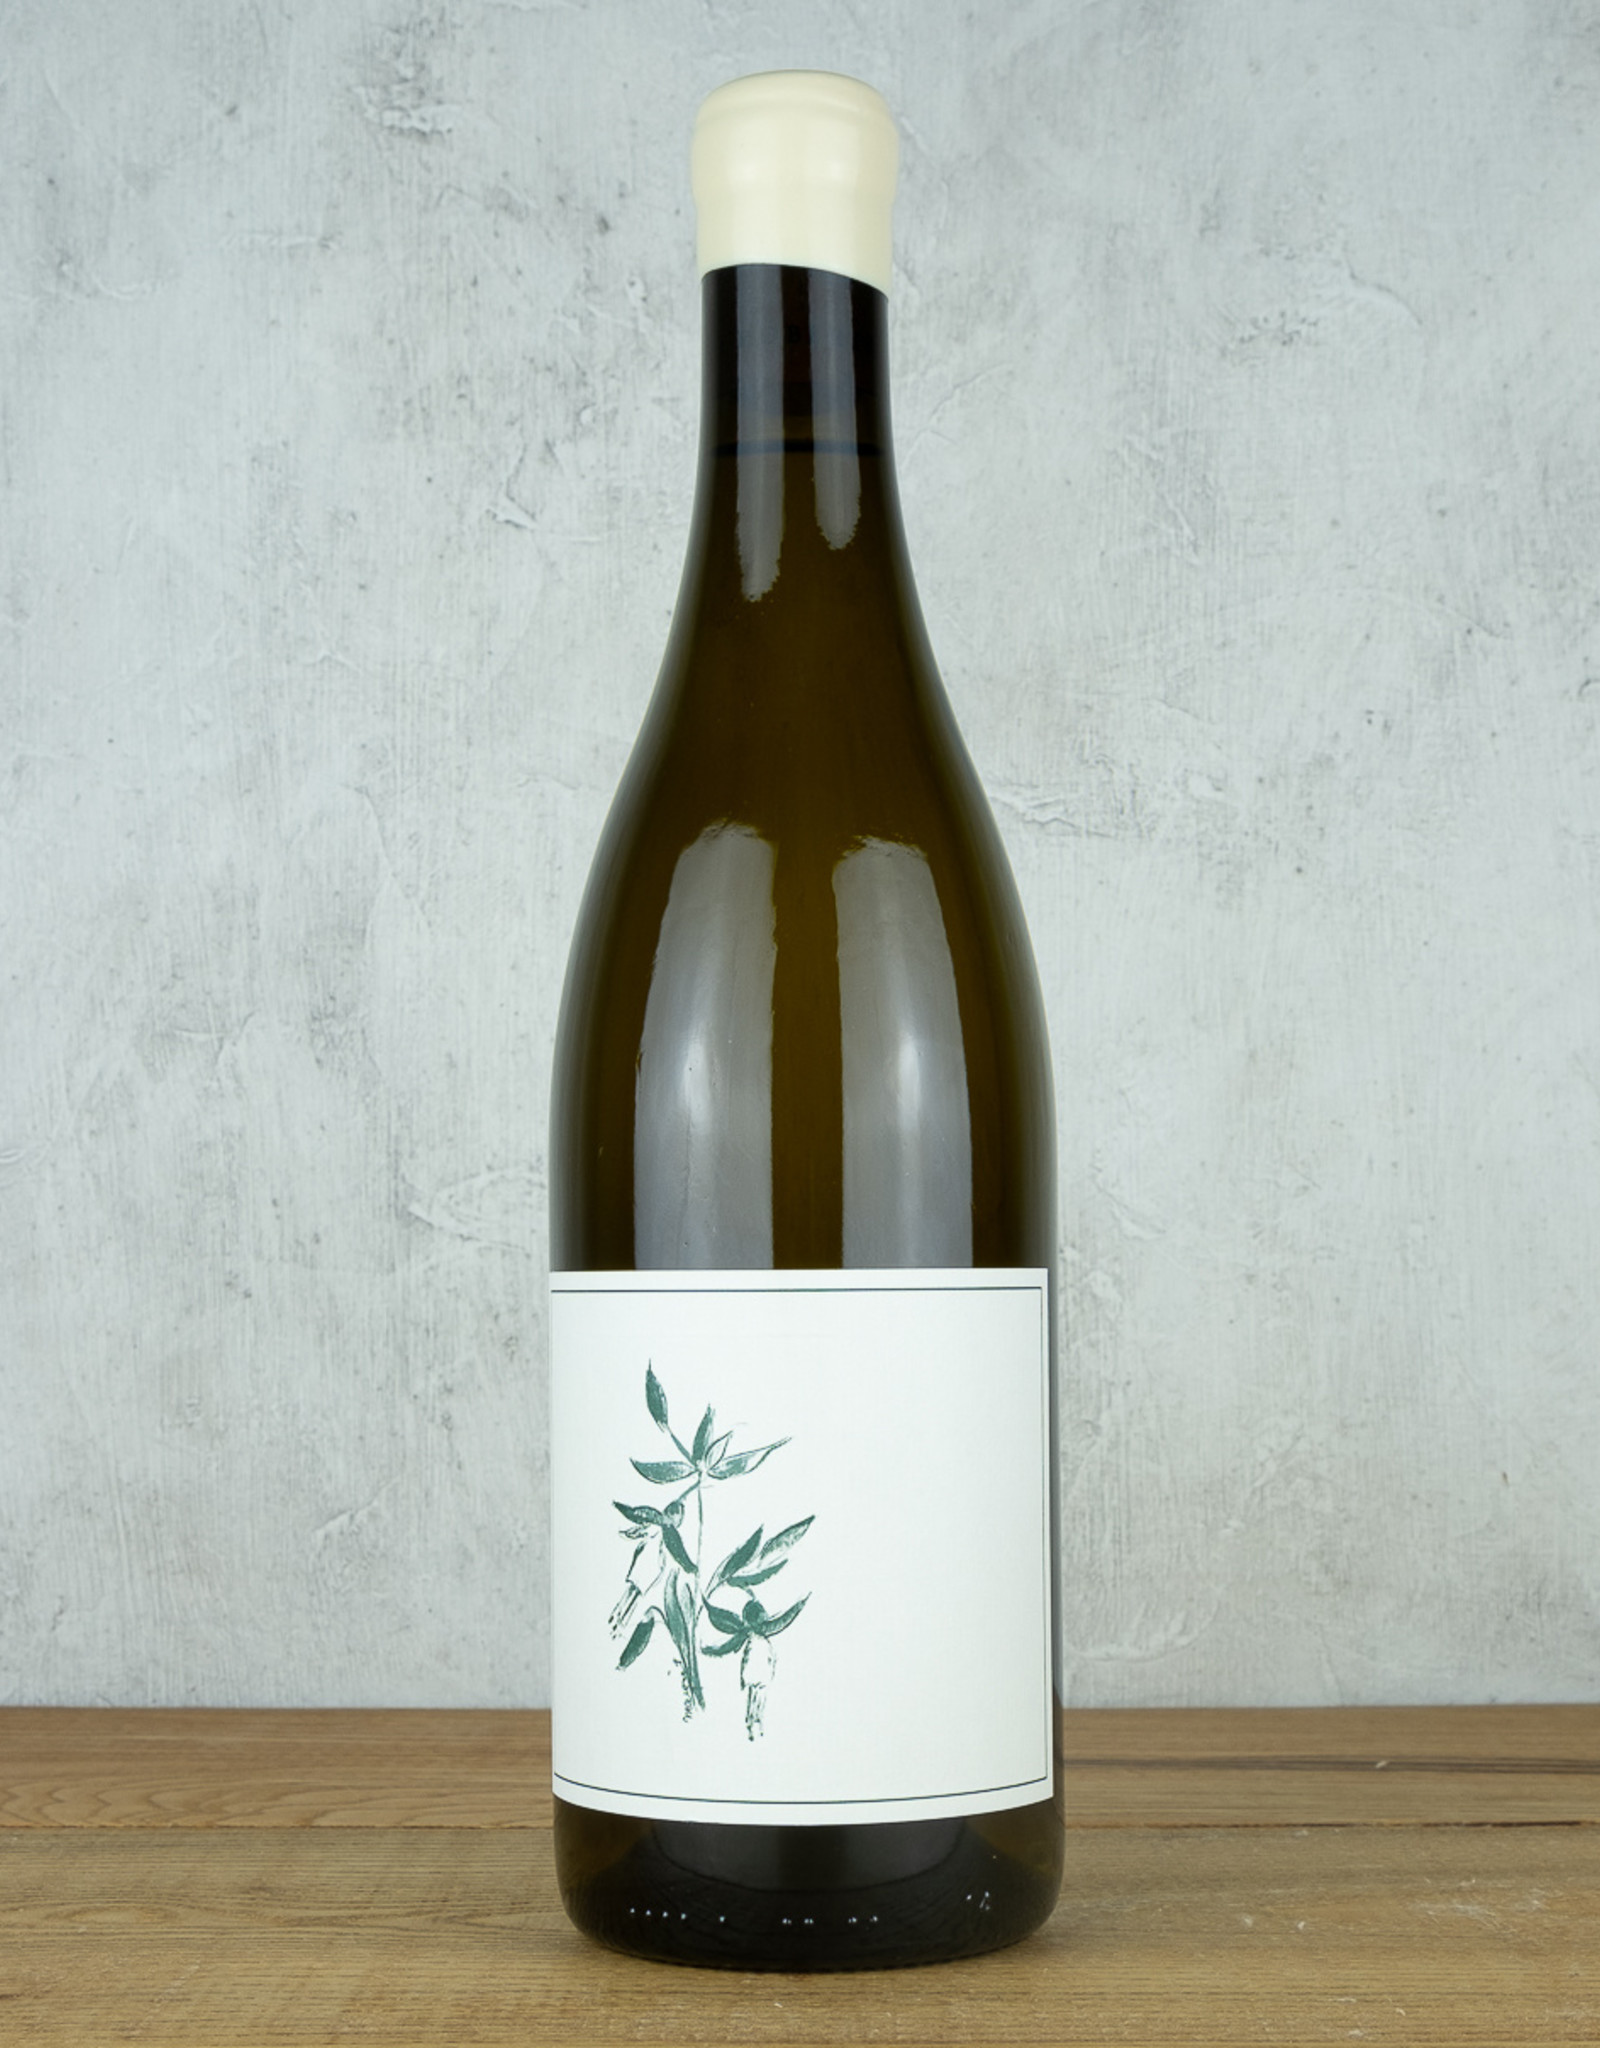 Arnot-Roberts Chardonnay Trout Gulch Vineyard